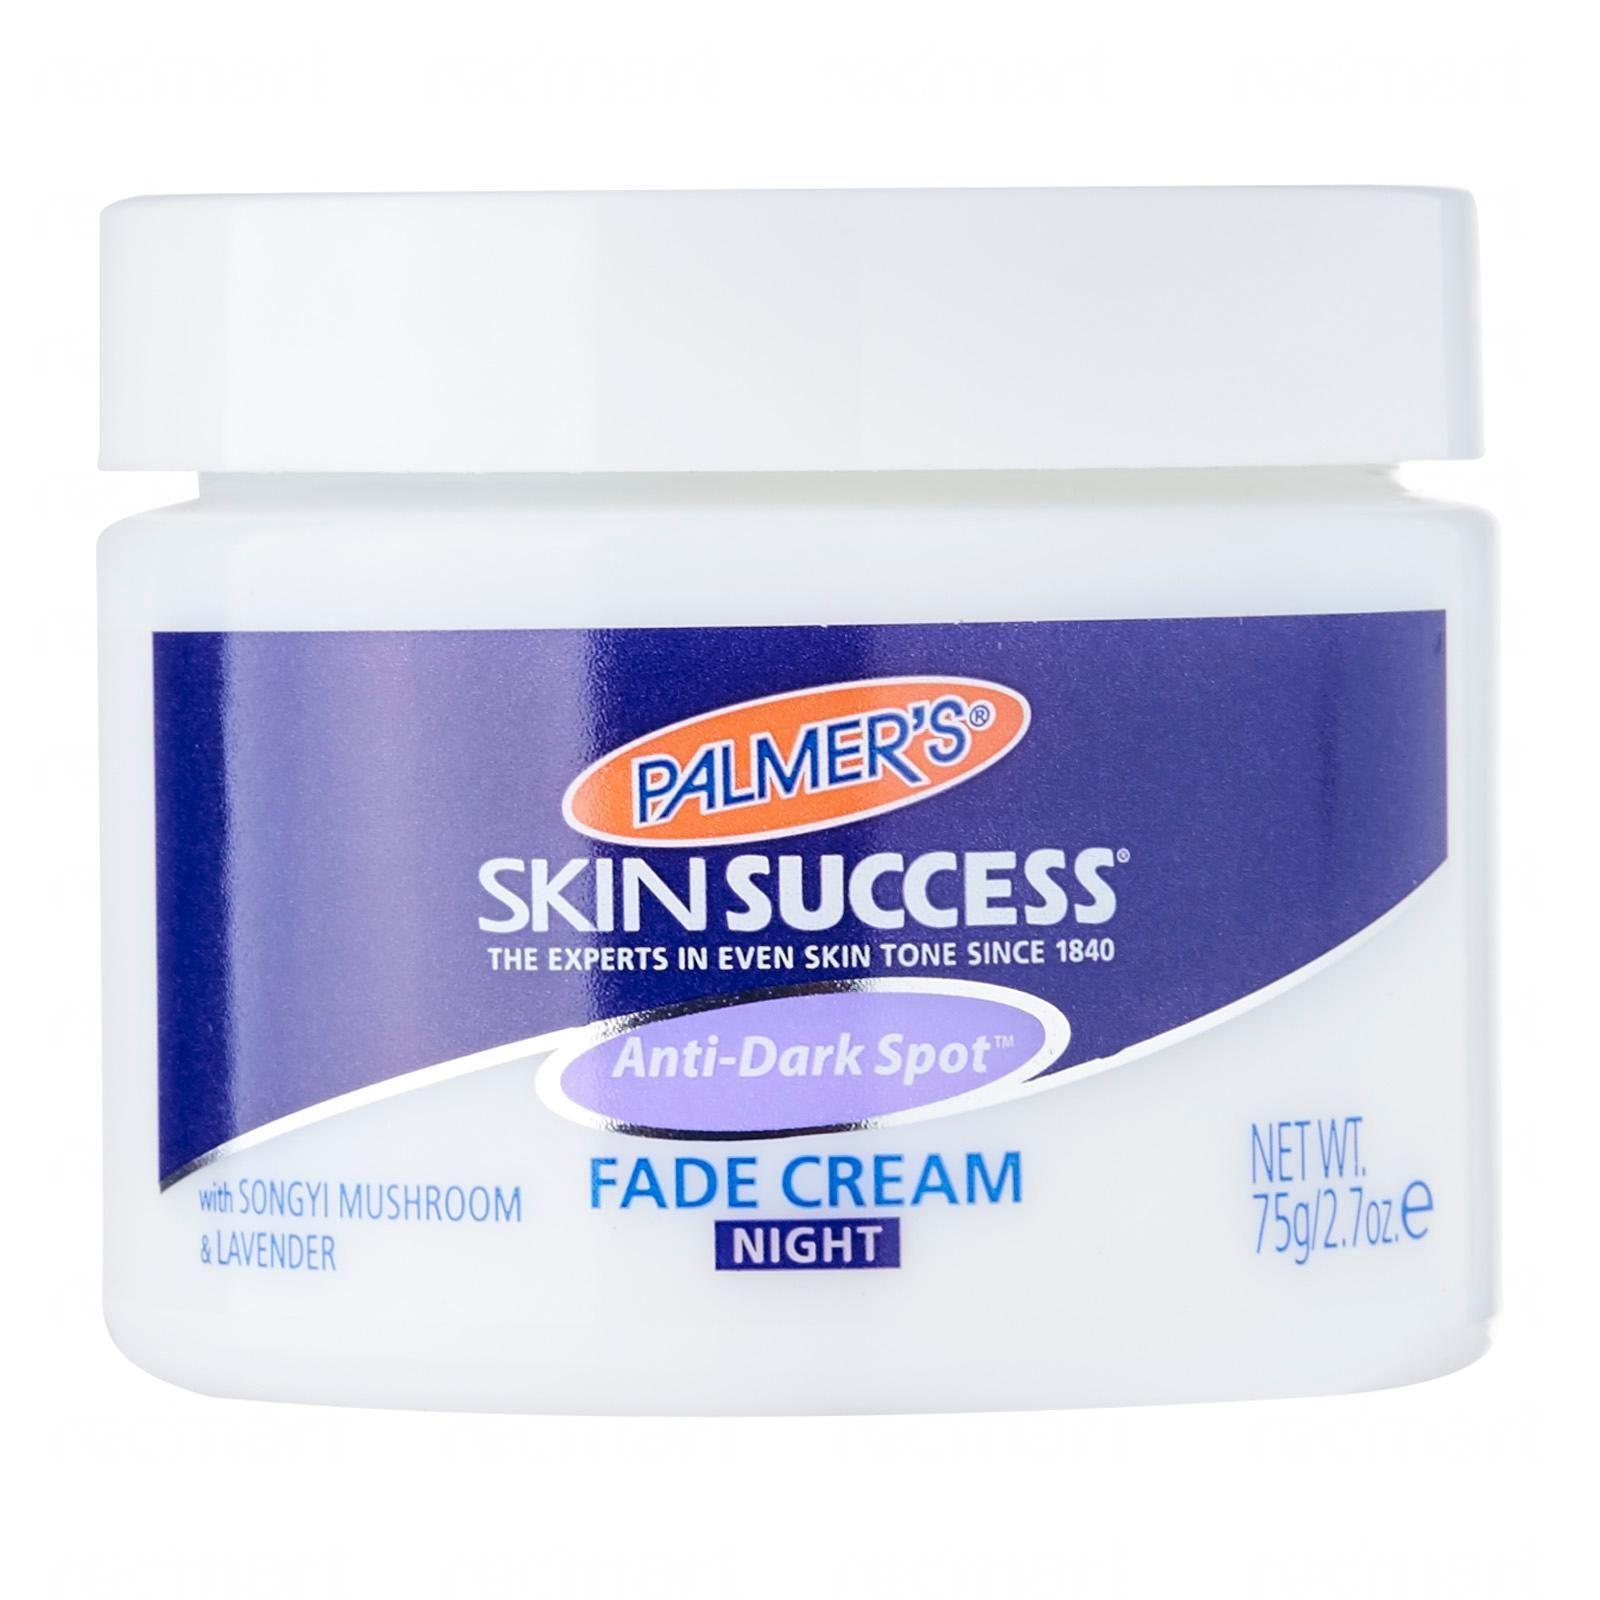 Palmer's Skin Success Anti-dark Spot Fade Cream Night - 75g